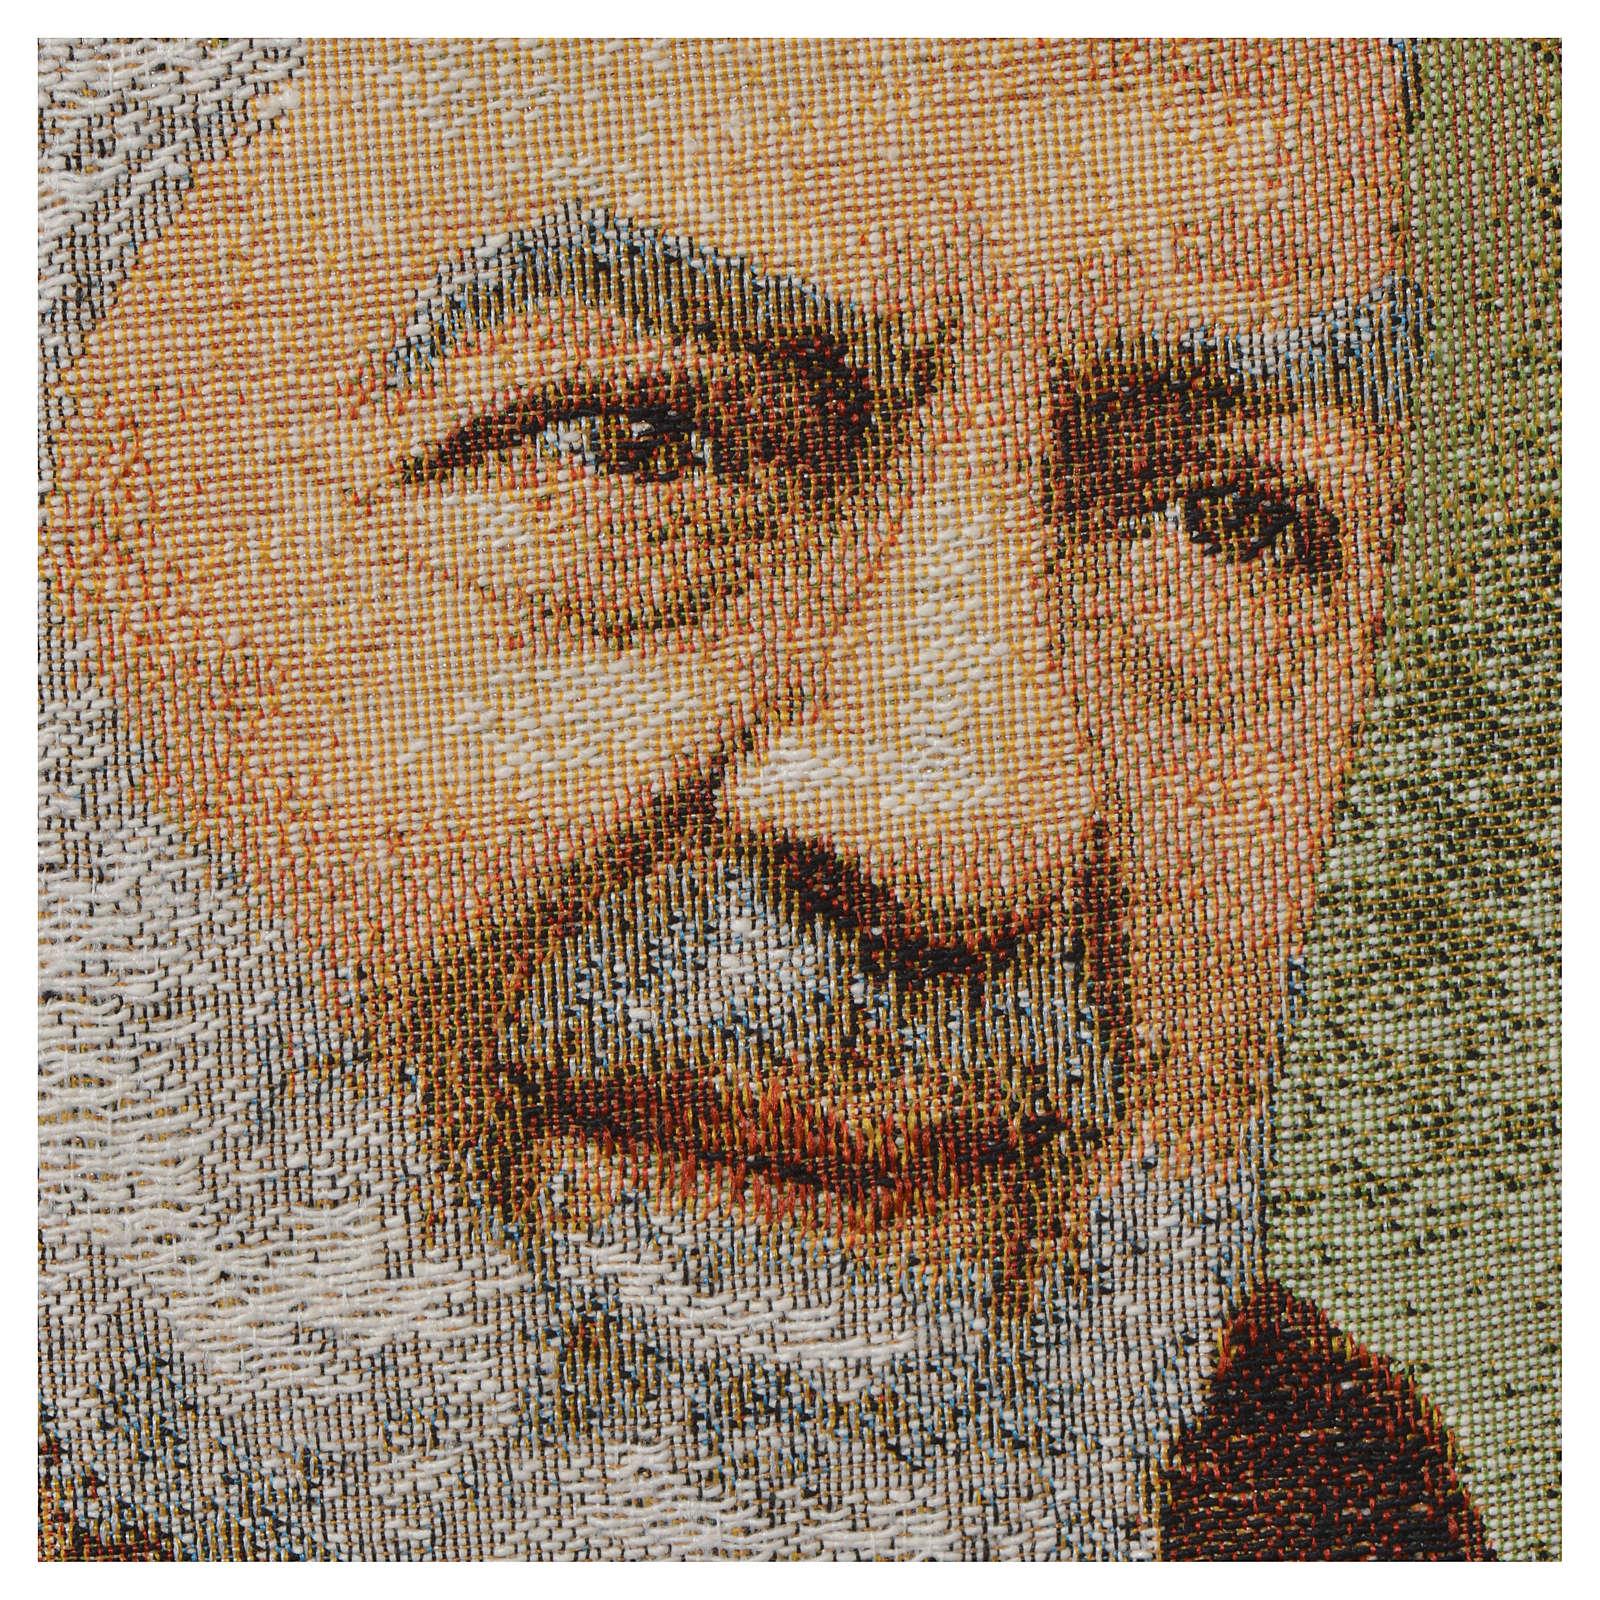 Tapisserie Père Pio 3